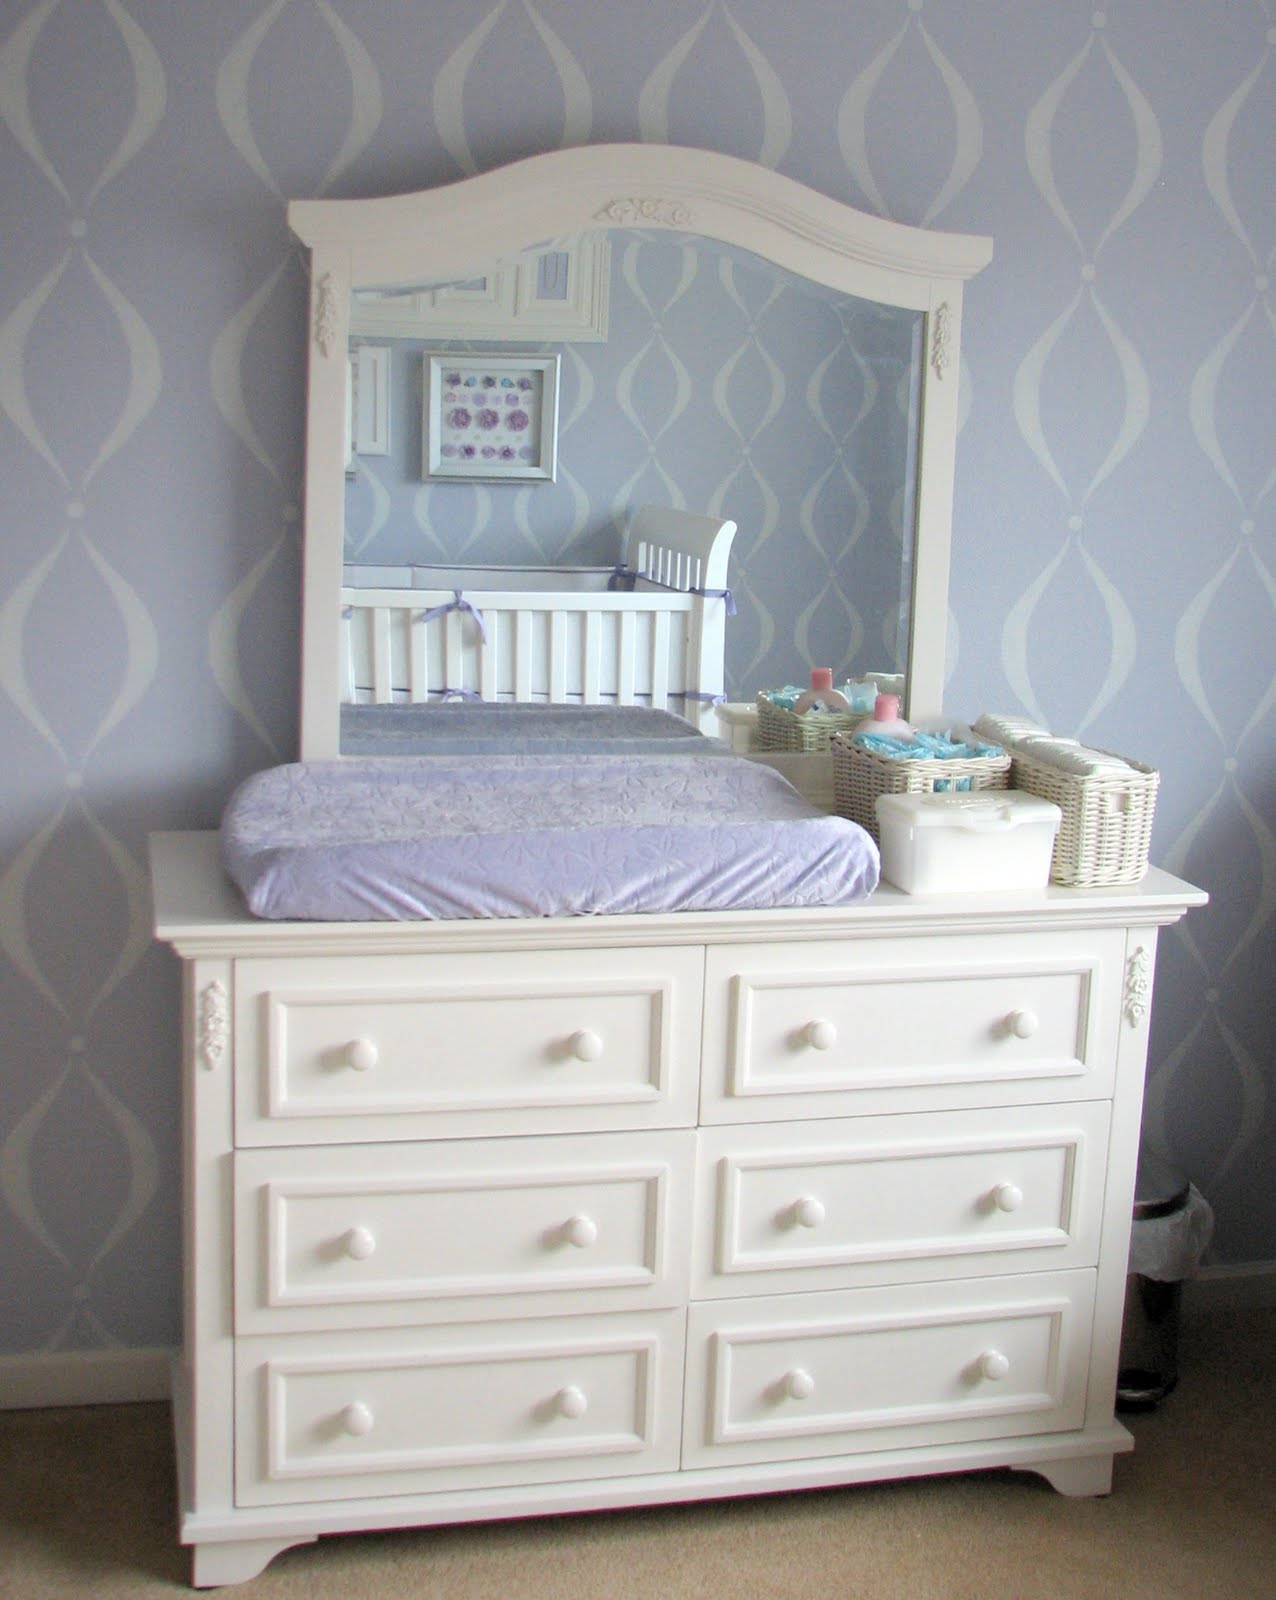 http://2.bp.blogspot.com/-8mpaC4JuPvk/Tf68YIv9nJI/AAAAAAAADOU/VDEuyU3LWjg/s1600/baby+girl+dresser.JPG